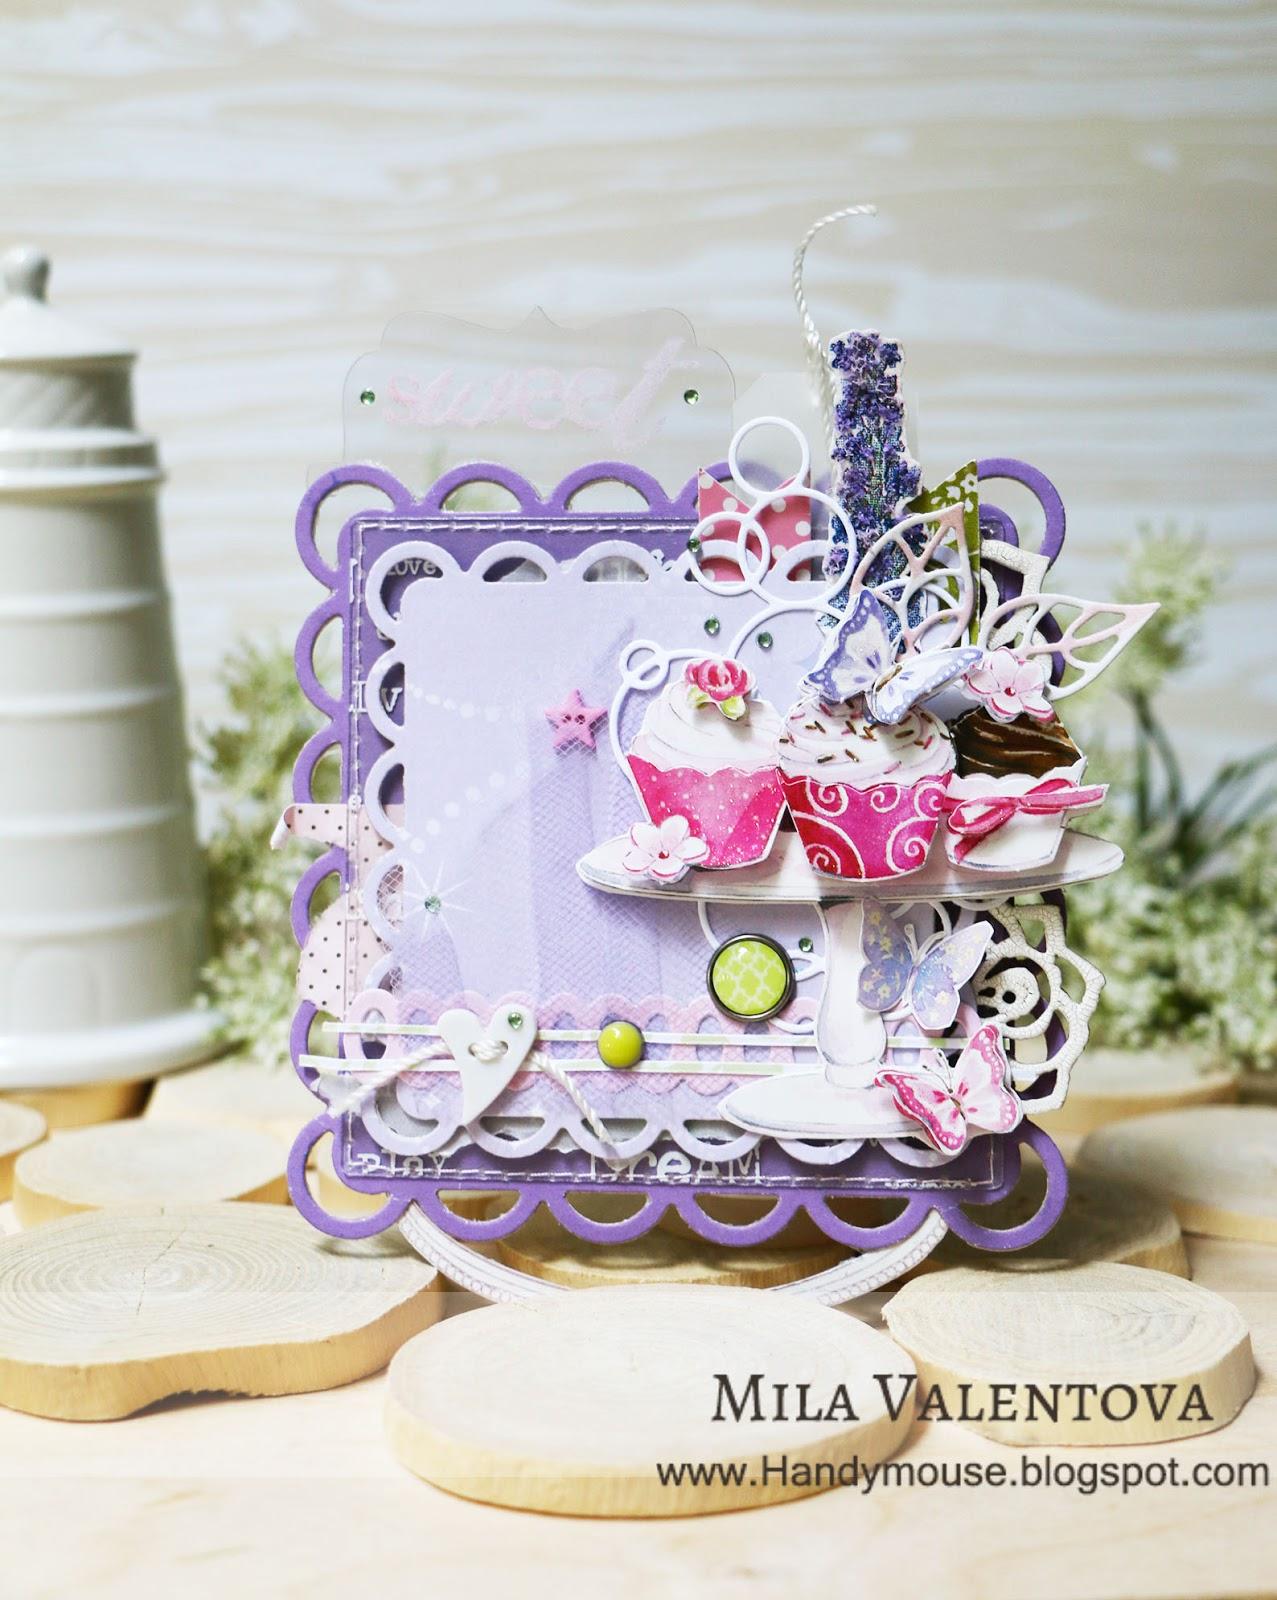 Магнит Лаванда и розовые сладости. Мила Валентова.